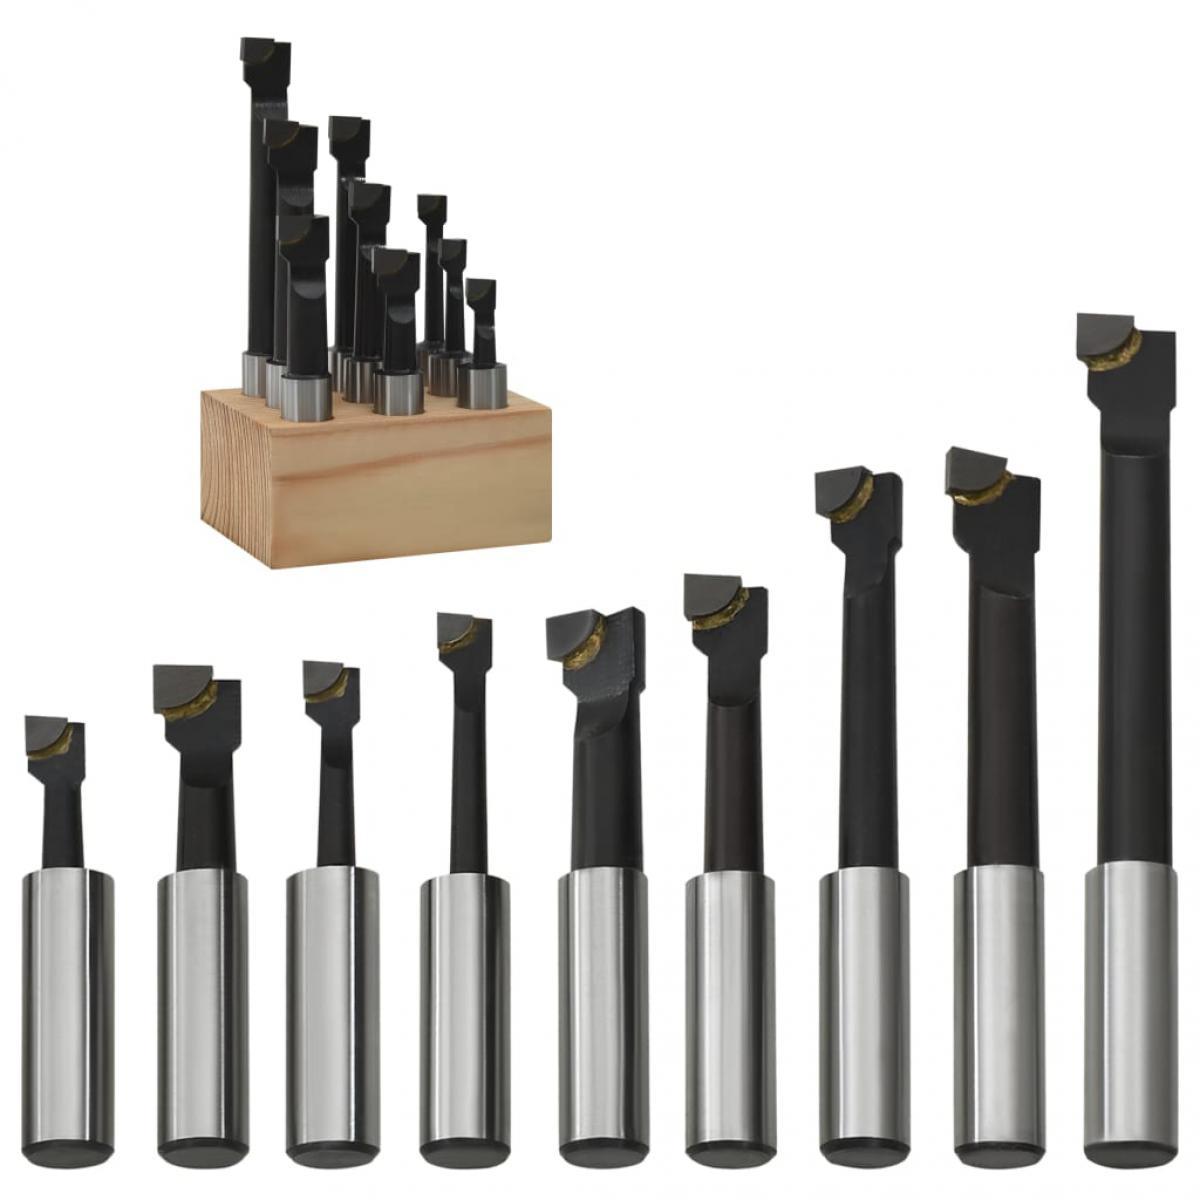 Vidaxl vidaXL Cutters de perçage 9 pcs 12 mm à base de bois